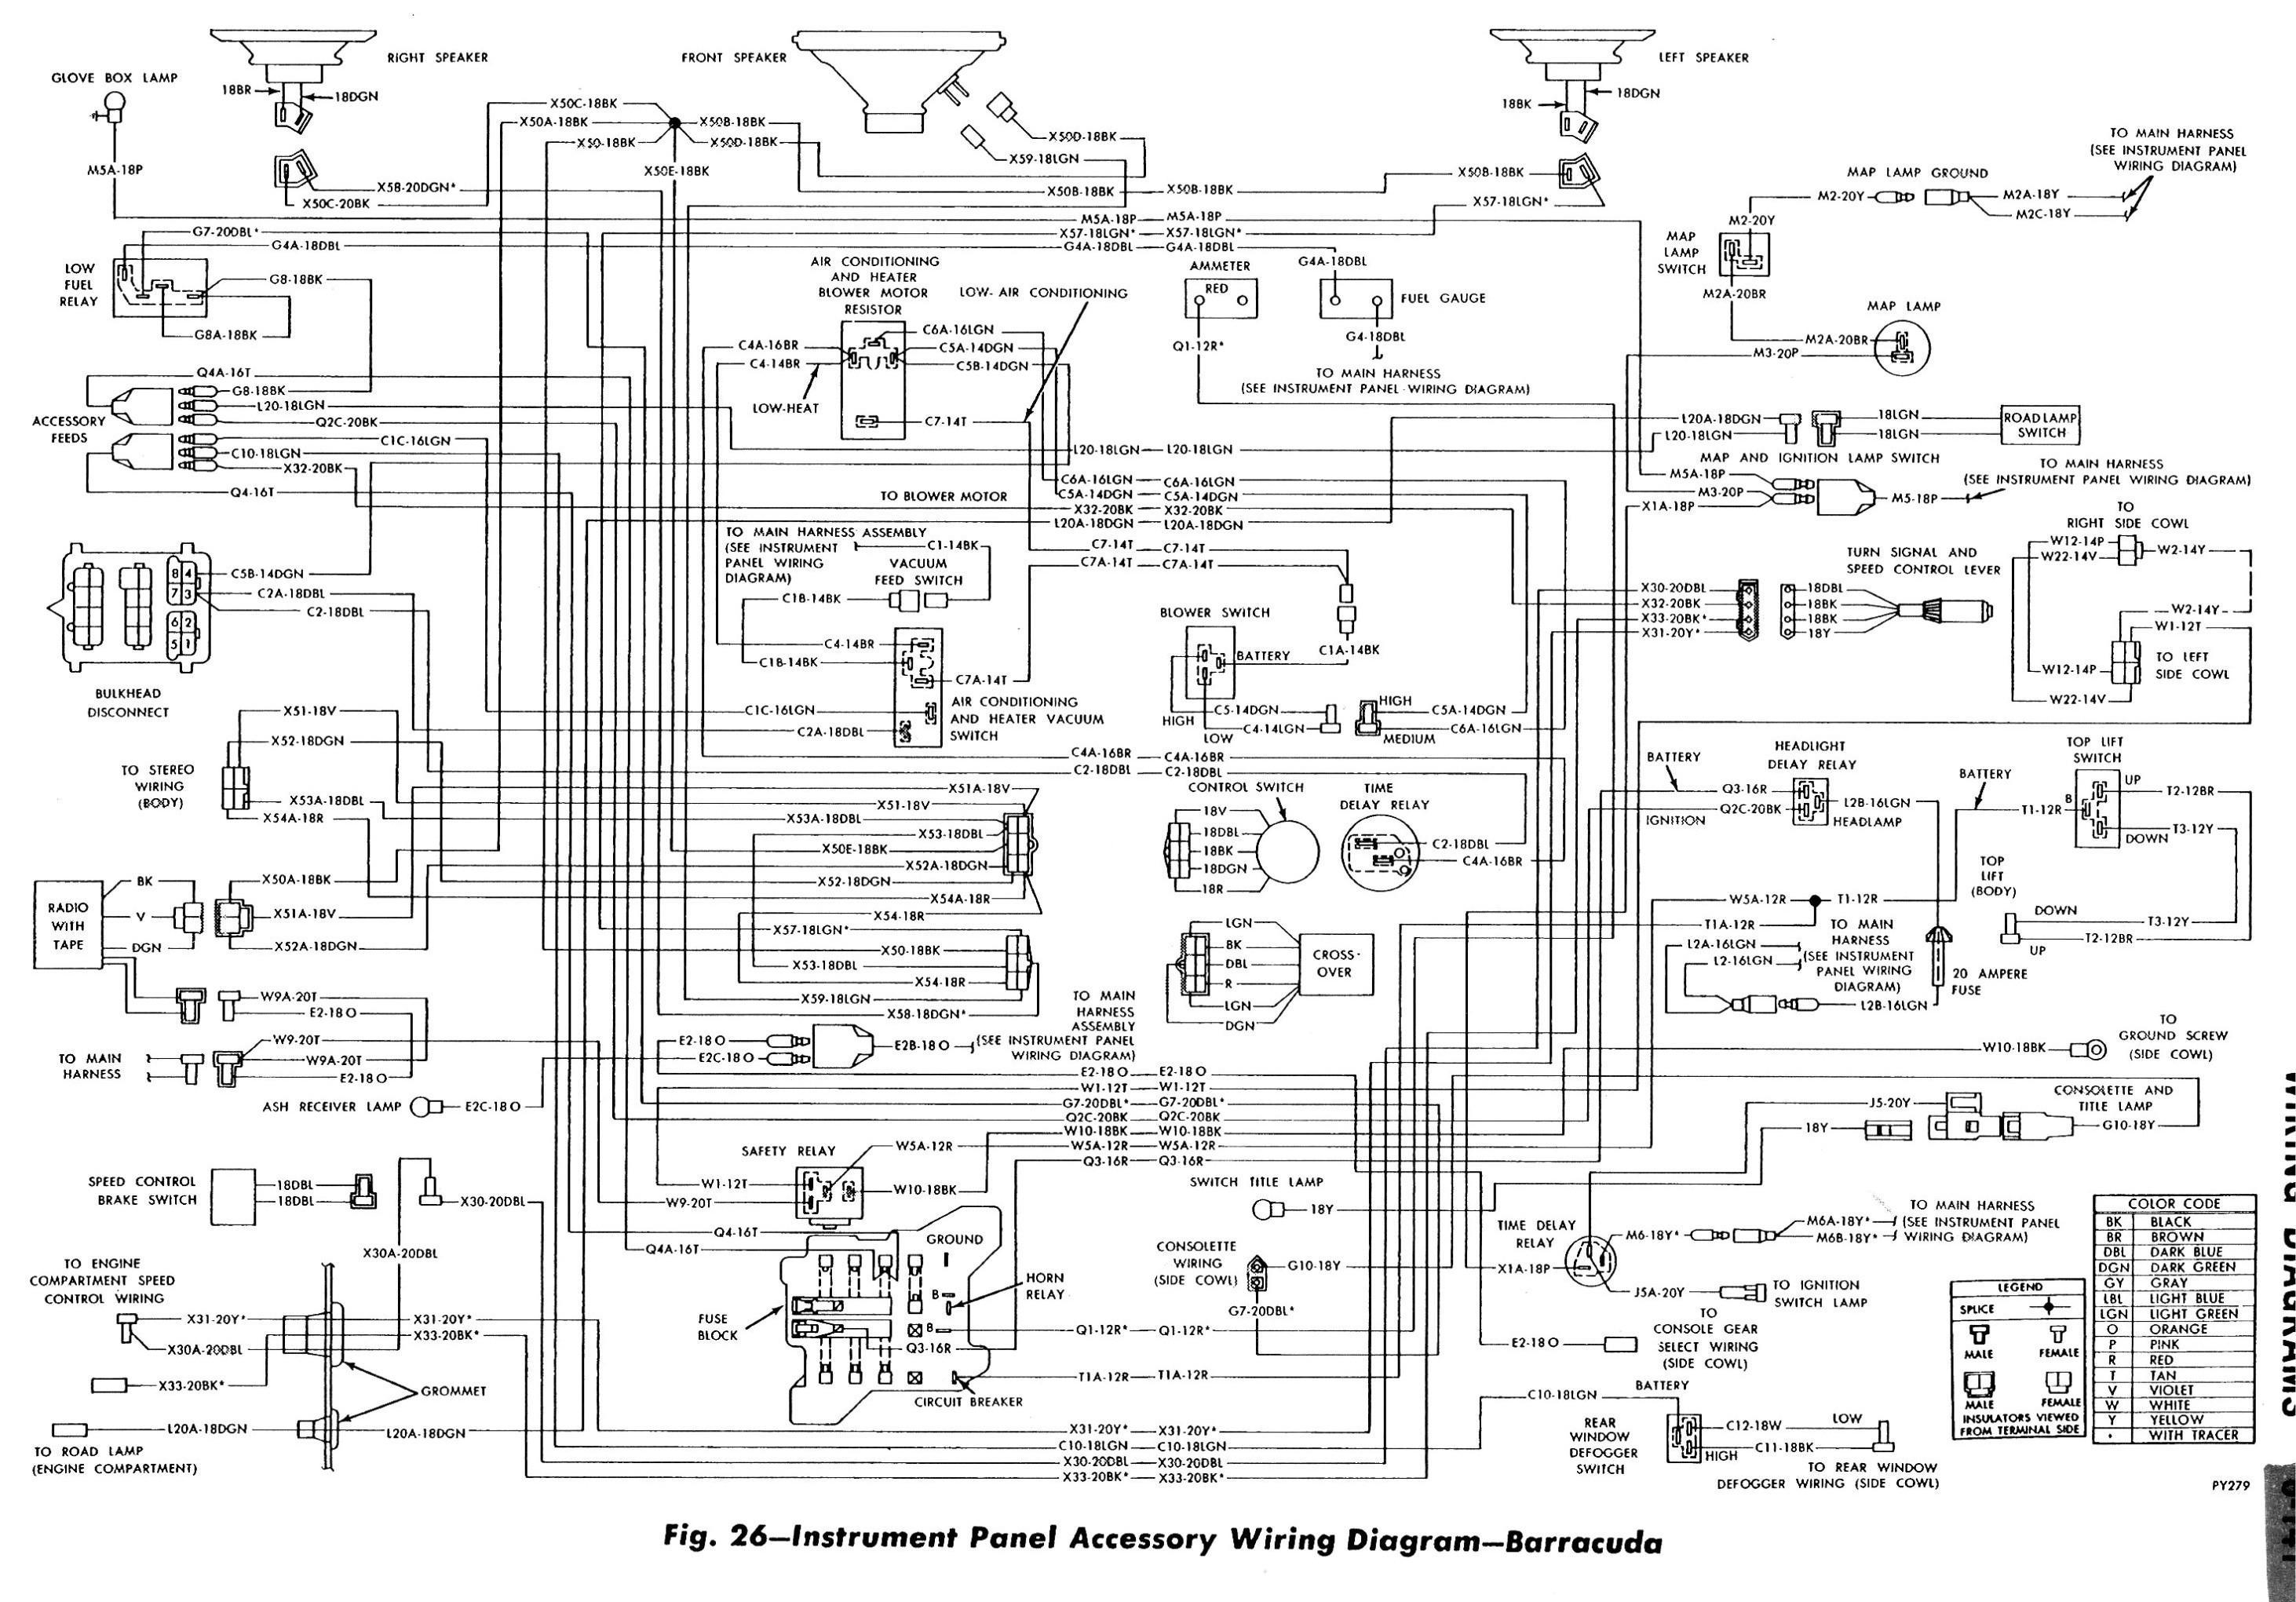 1969 plymouth fury wiring diagram